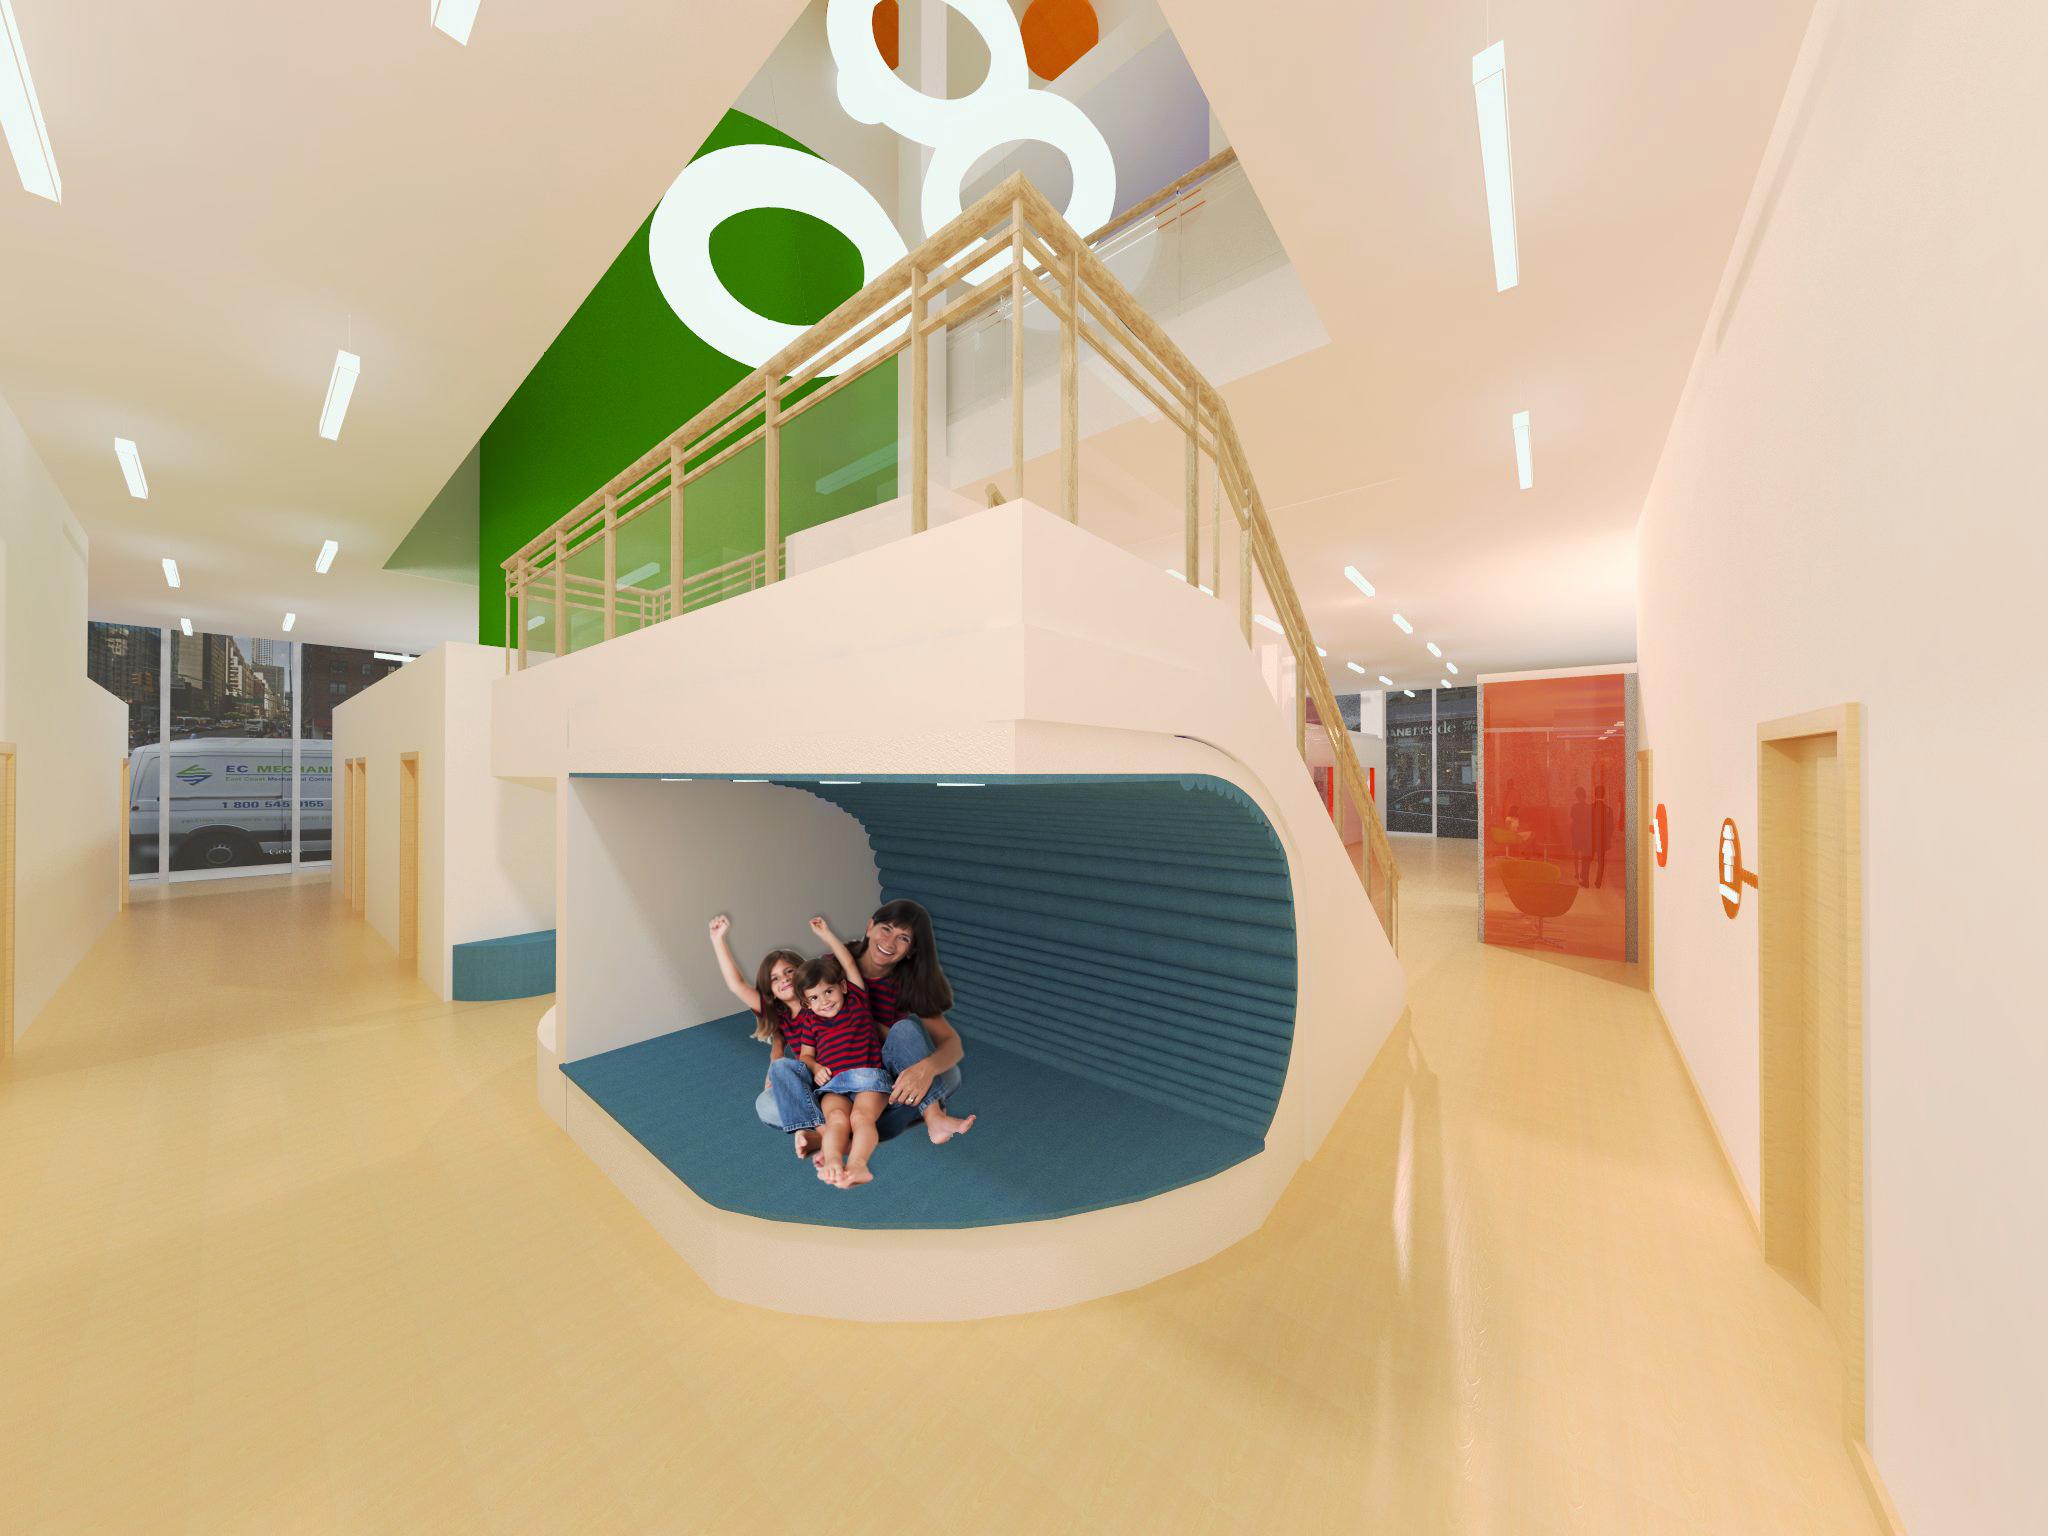 irina-kaminsky-tower-preschool-mfa-1_17574039845_o.jpg